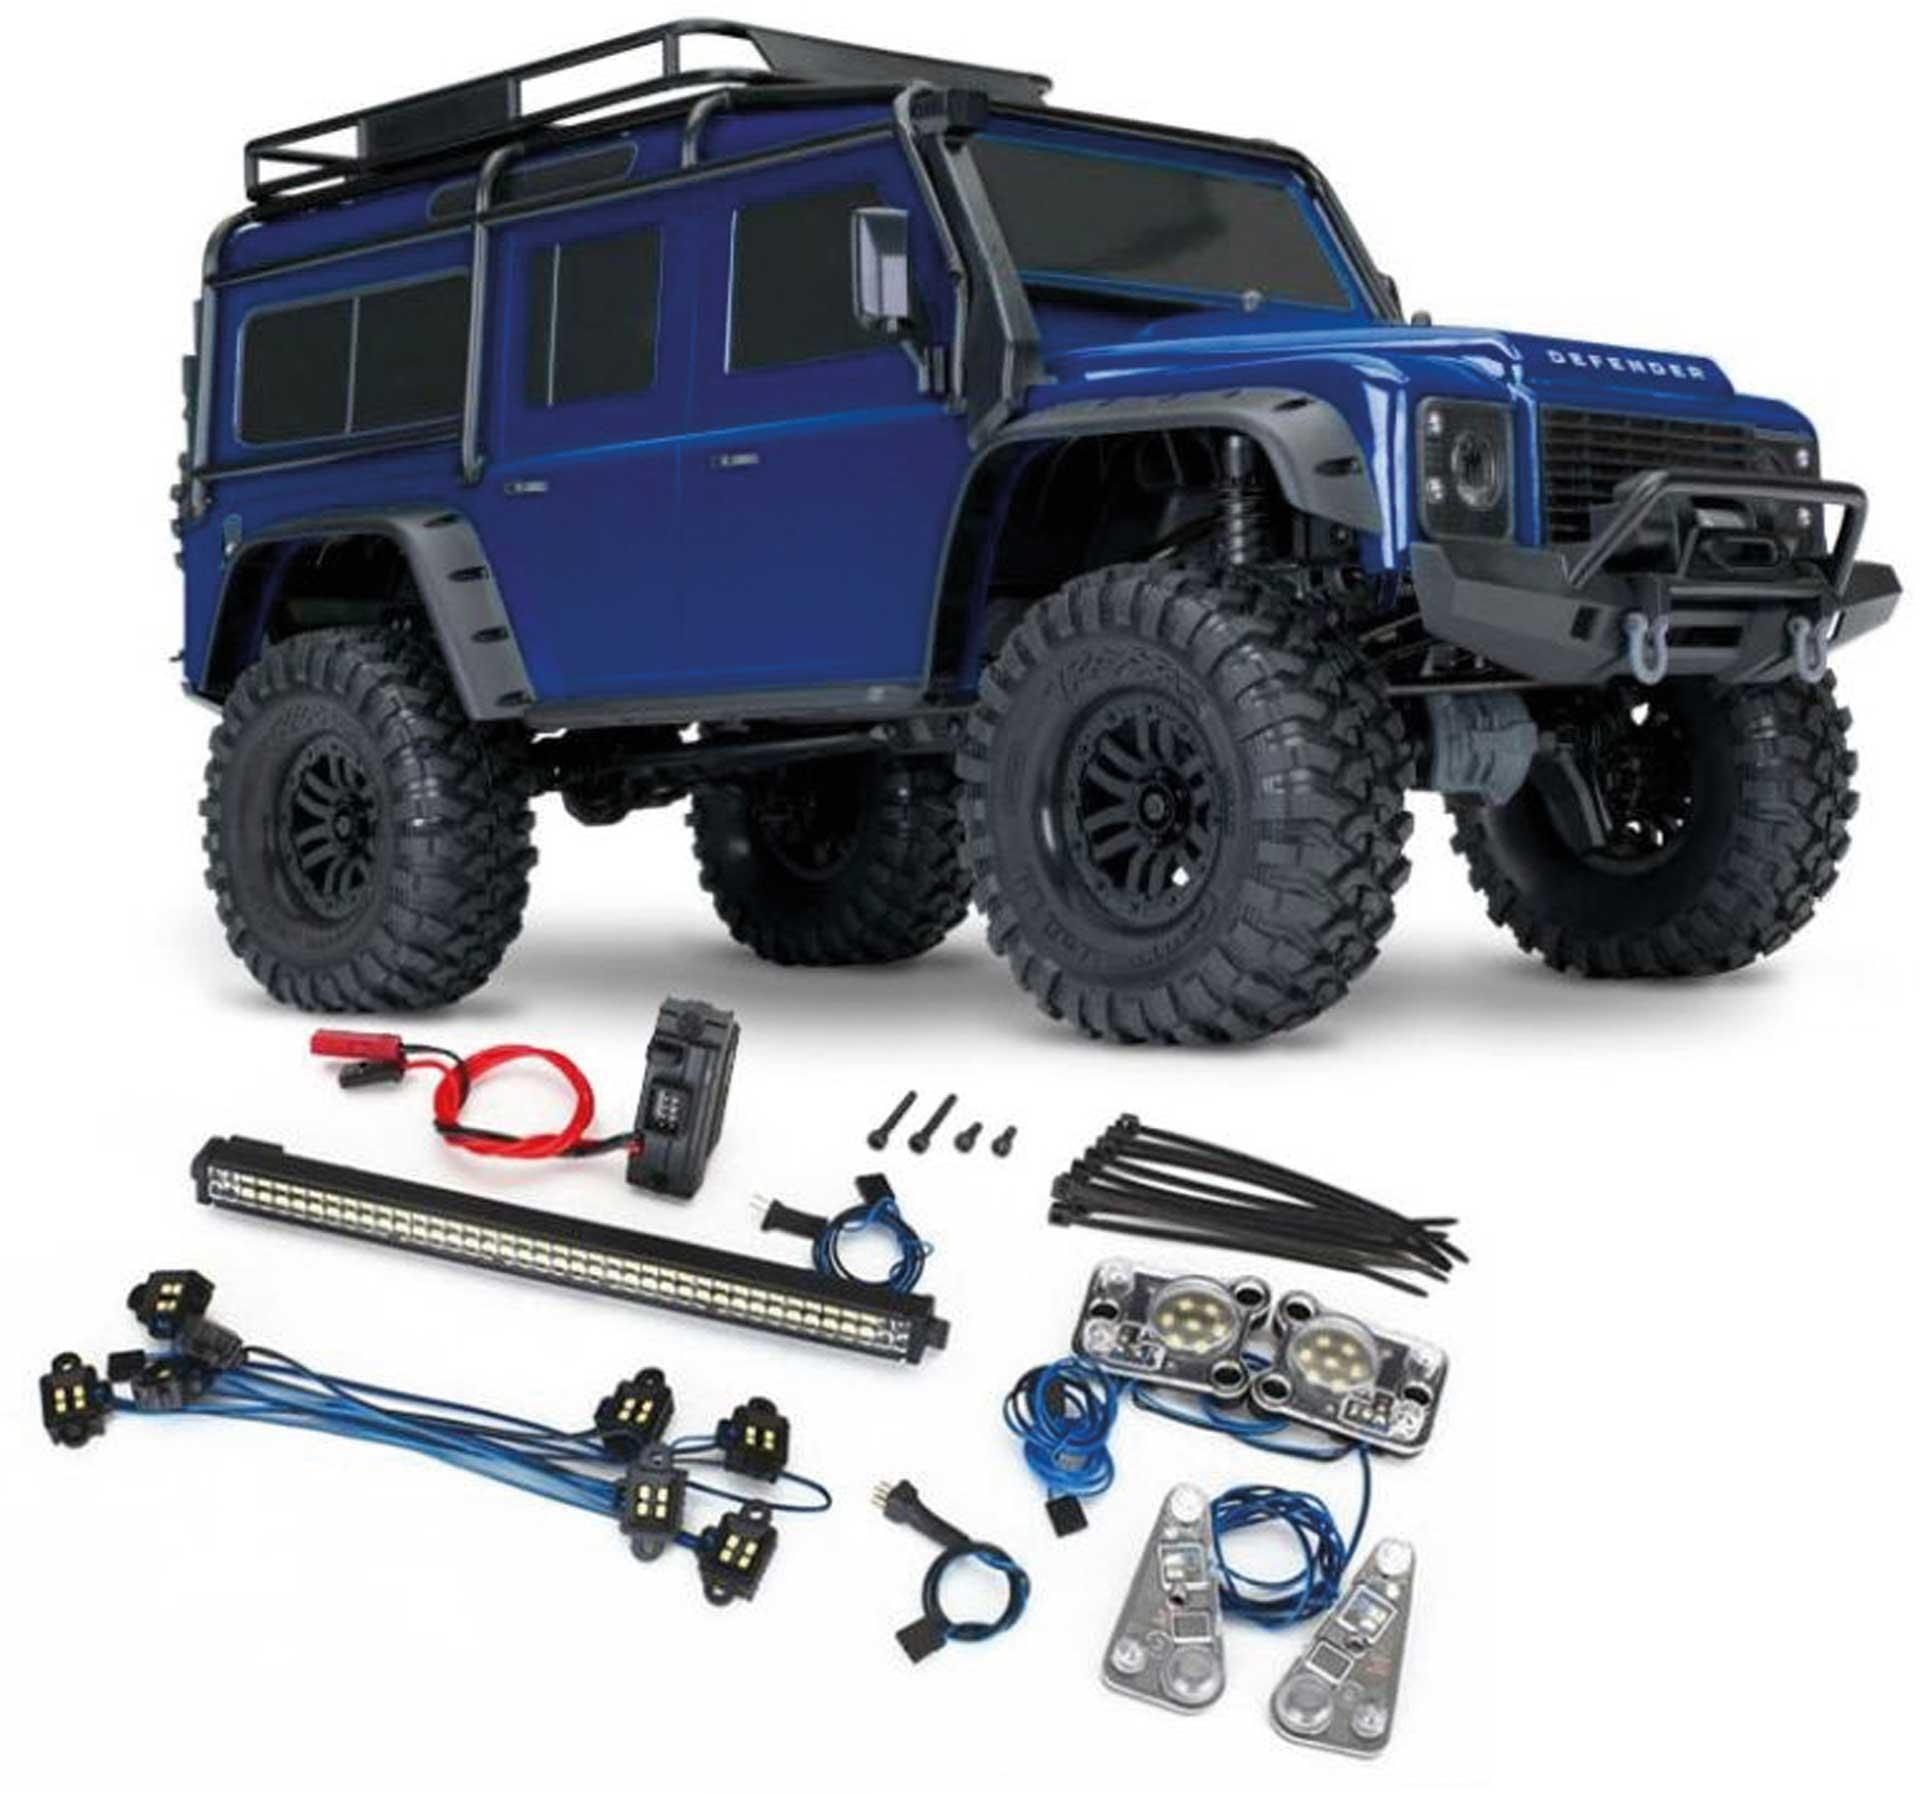 TRAXXAS TRX-4 LR DEFENDER 4X4 METALLICBLAU RTR MIT LICHT-SET 1/10 4WD SCALE-CRAWLER BRUSHED (TRX82056 + TRX8030) *AKTION*